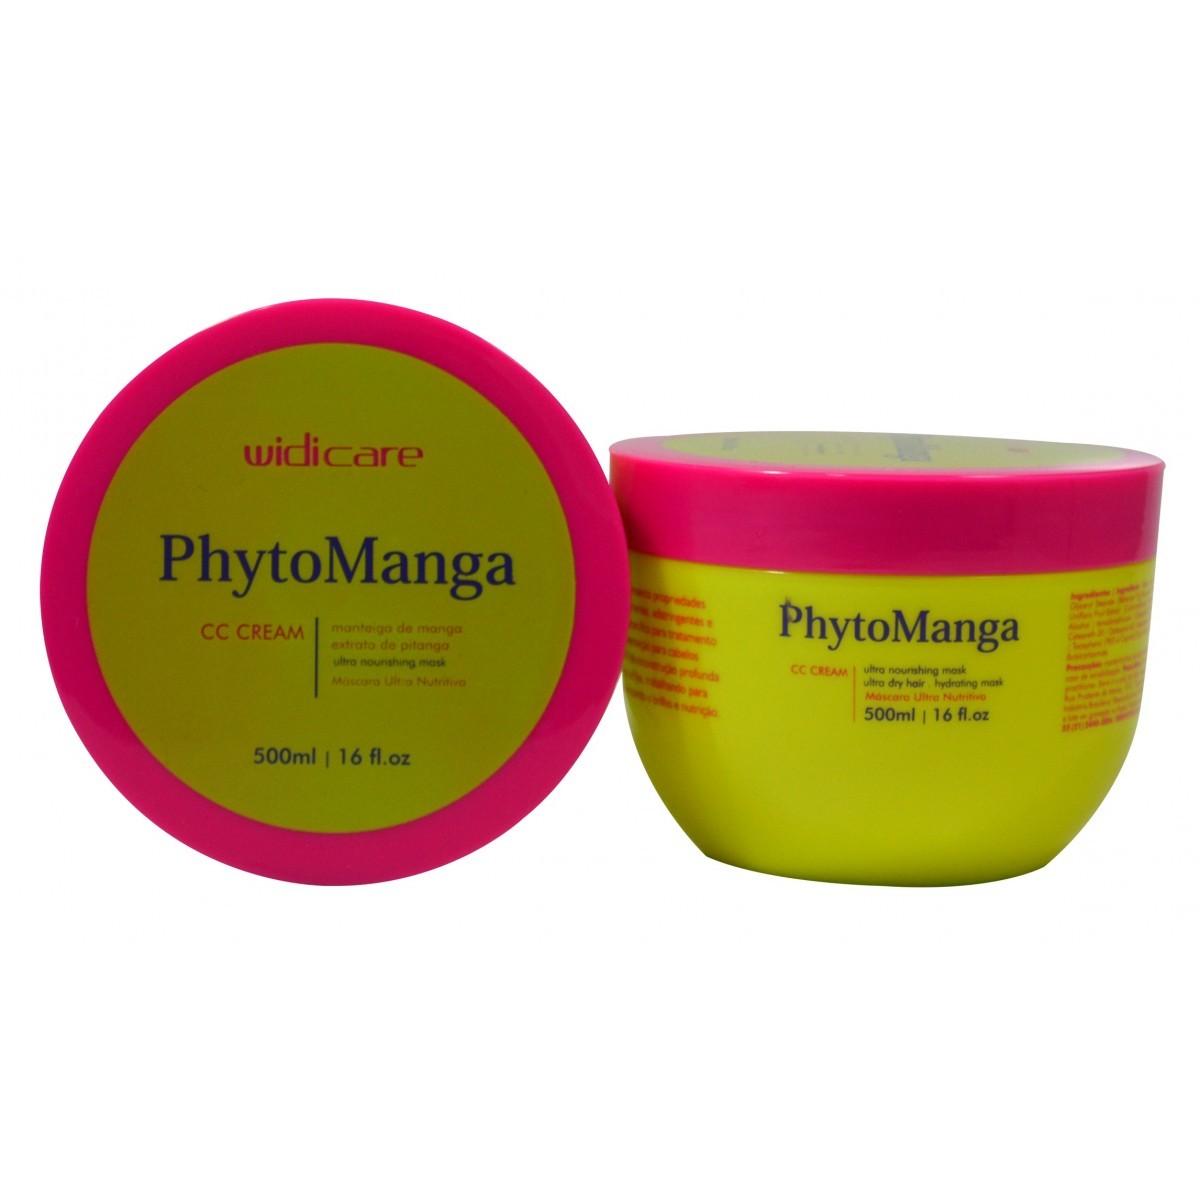 Widi Care - CC CREAM - PhytoManga - Máscara de Tratamento